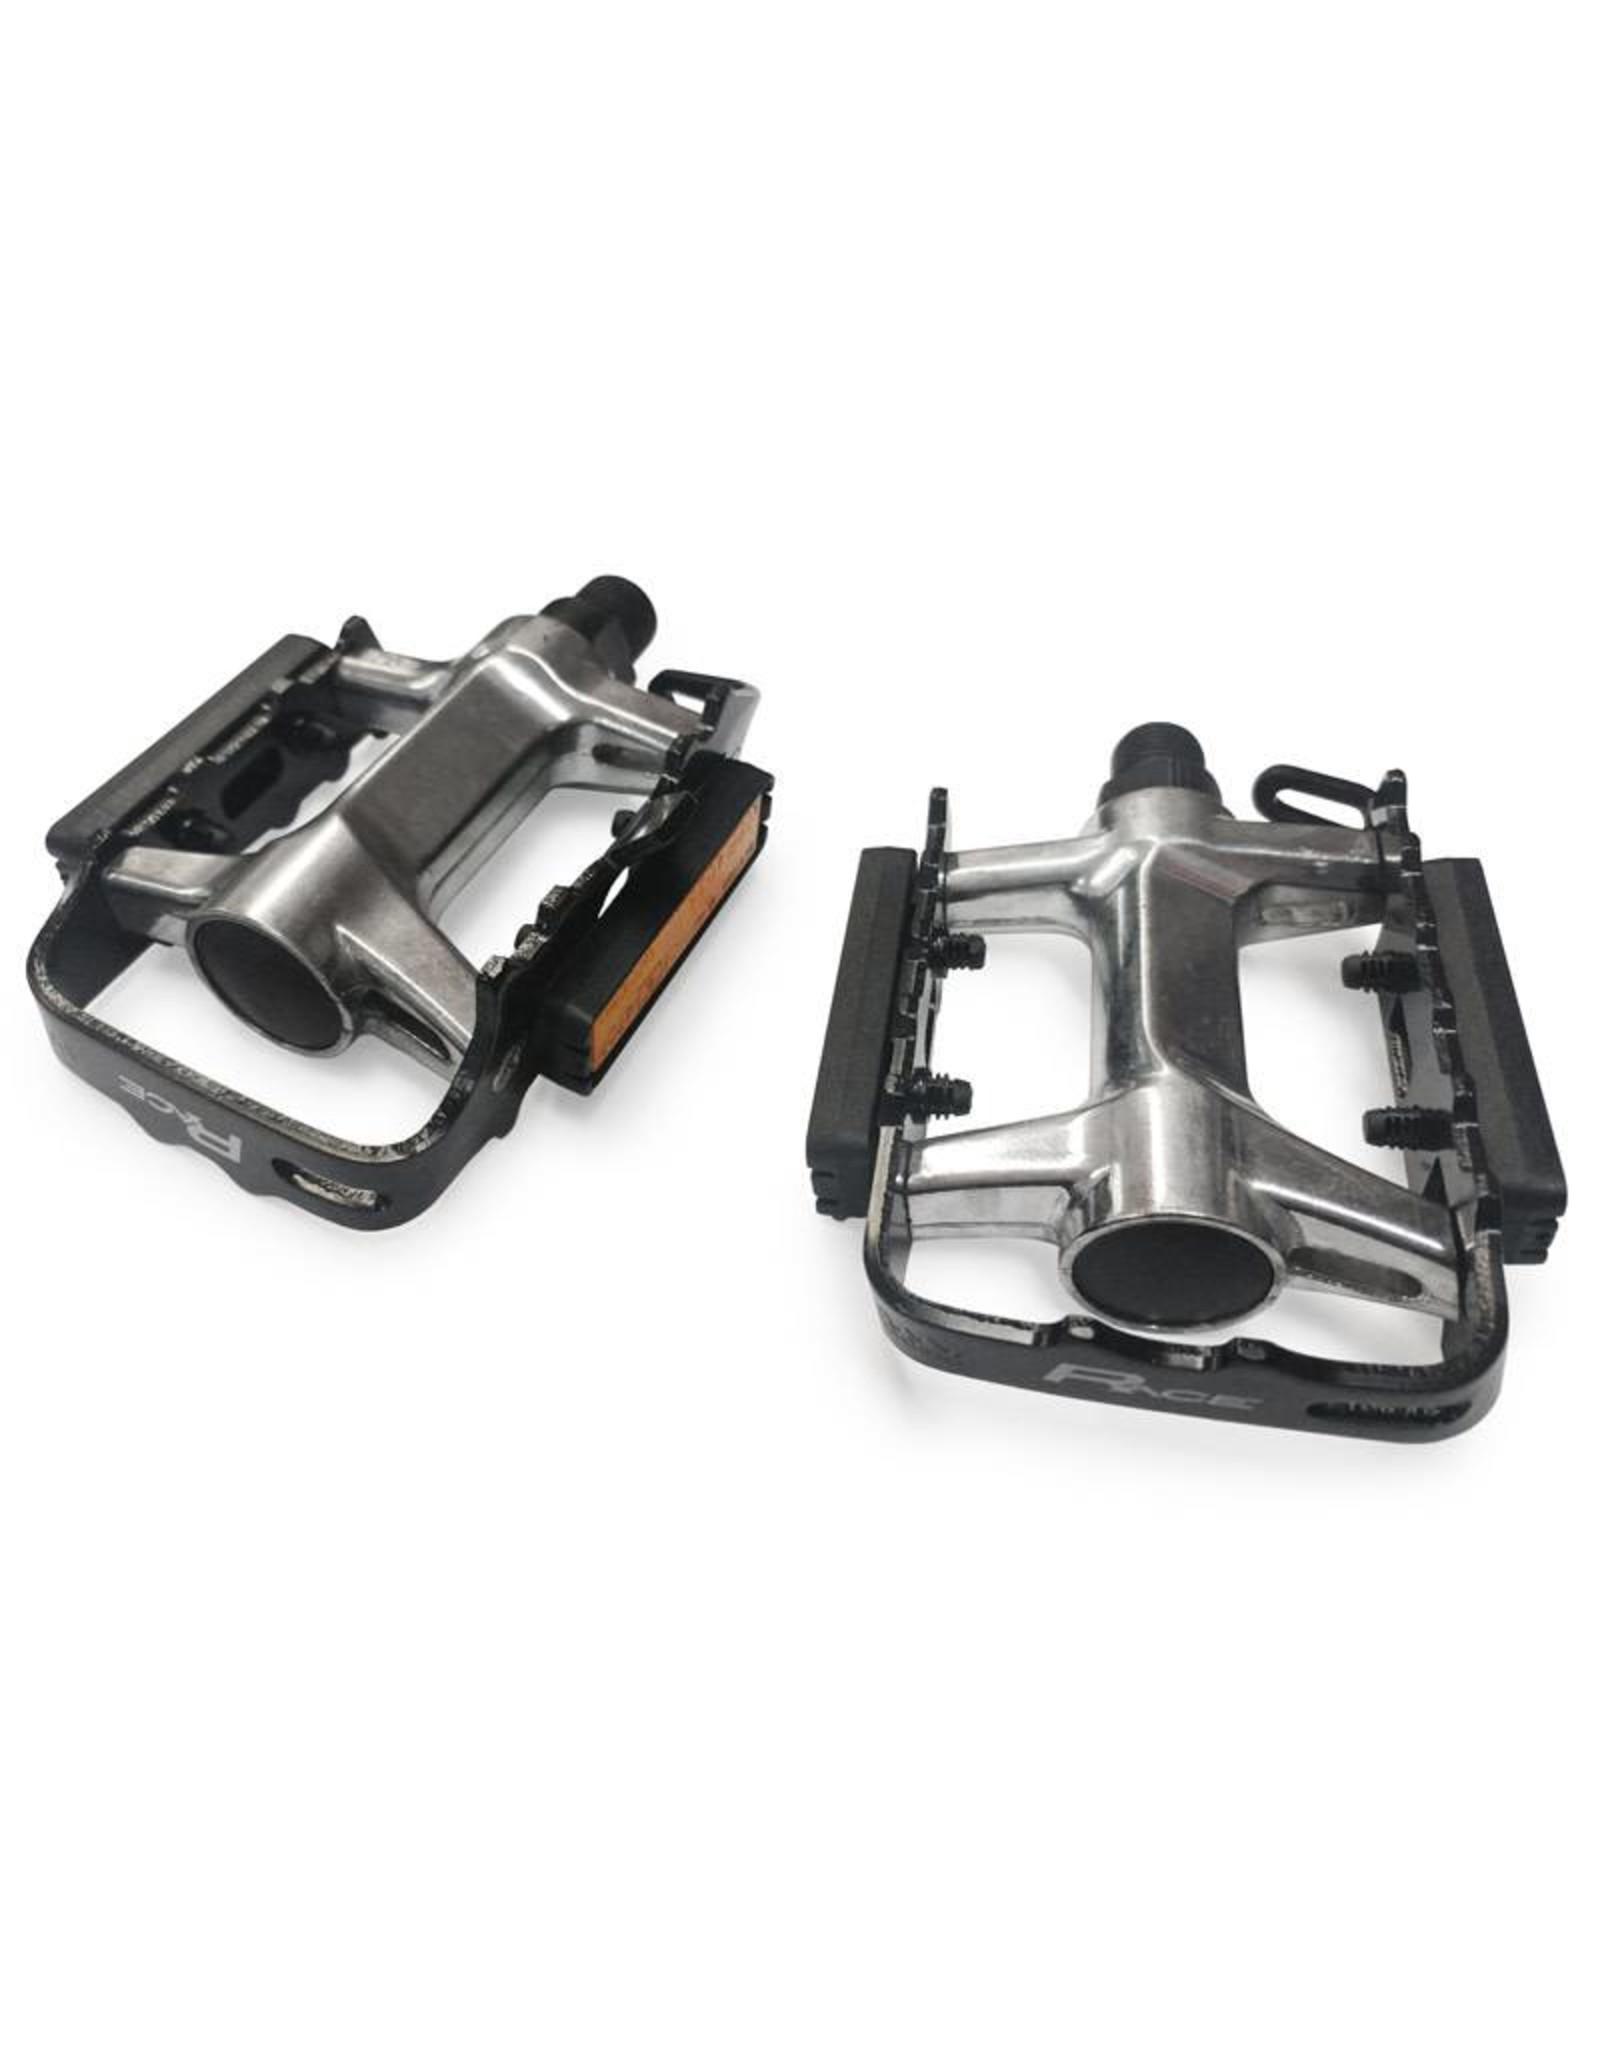 Race LU-946 pedals